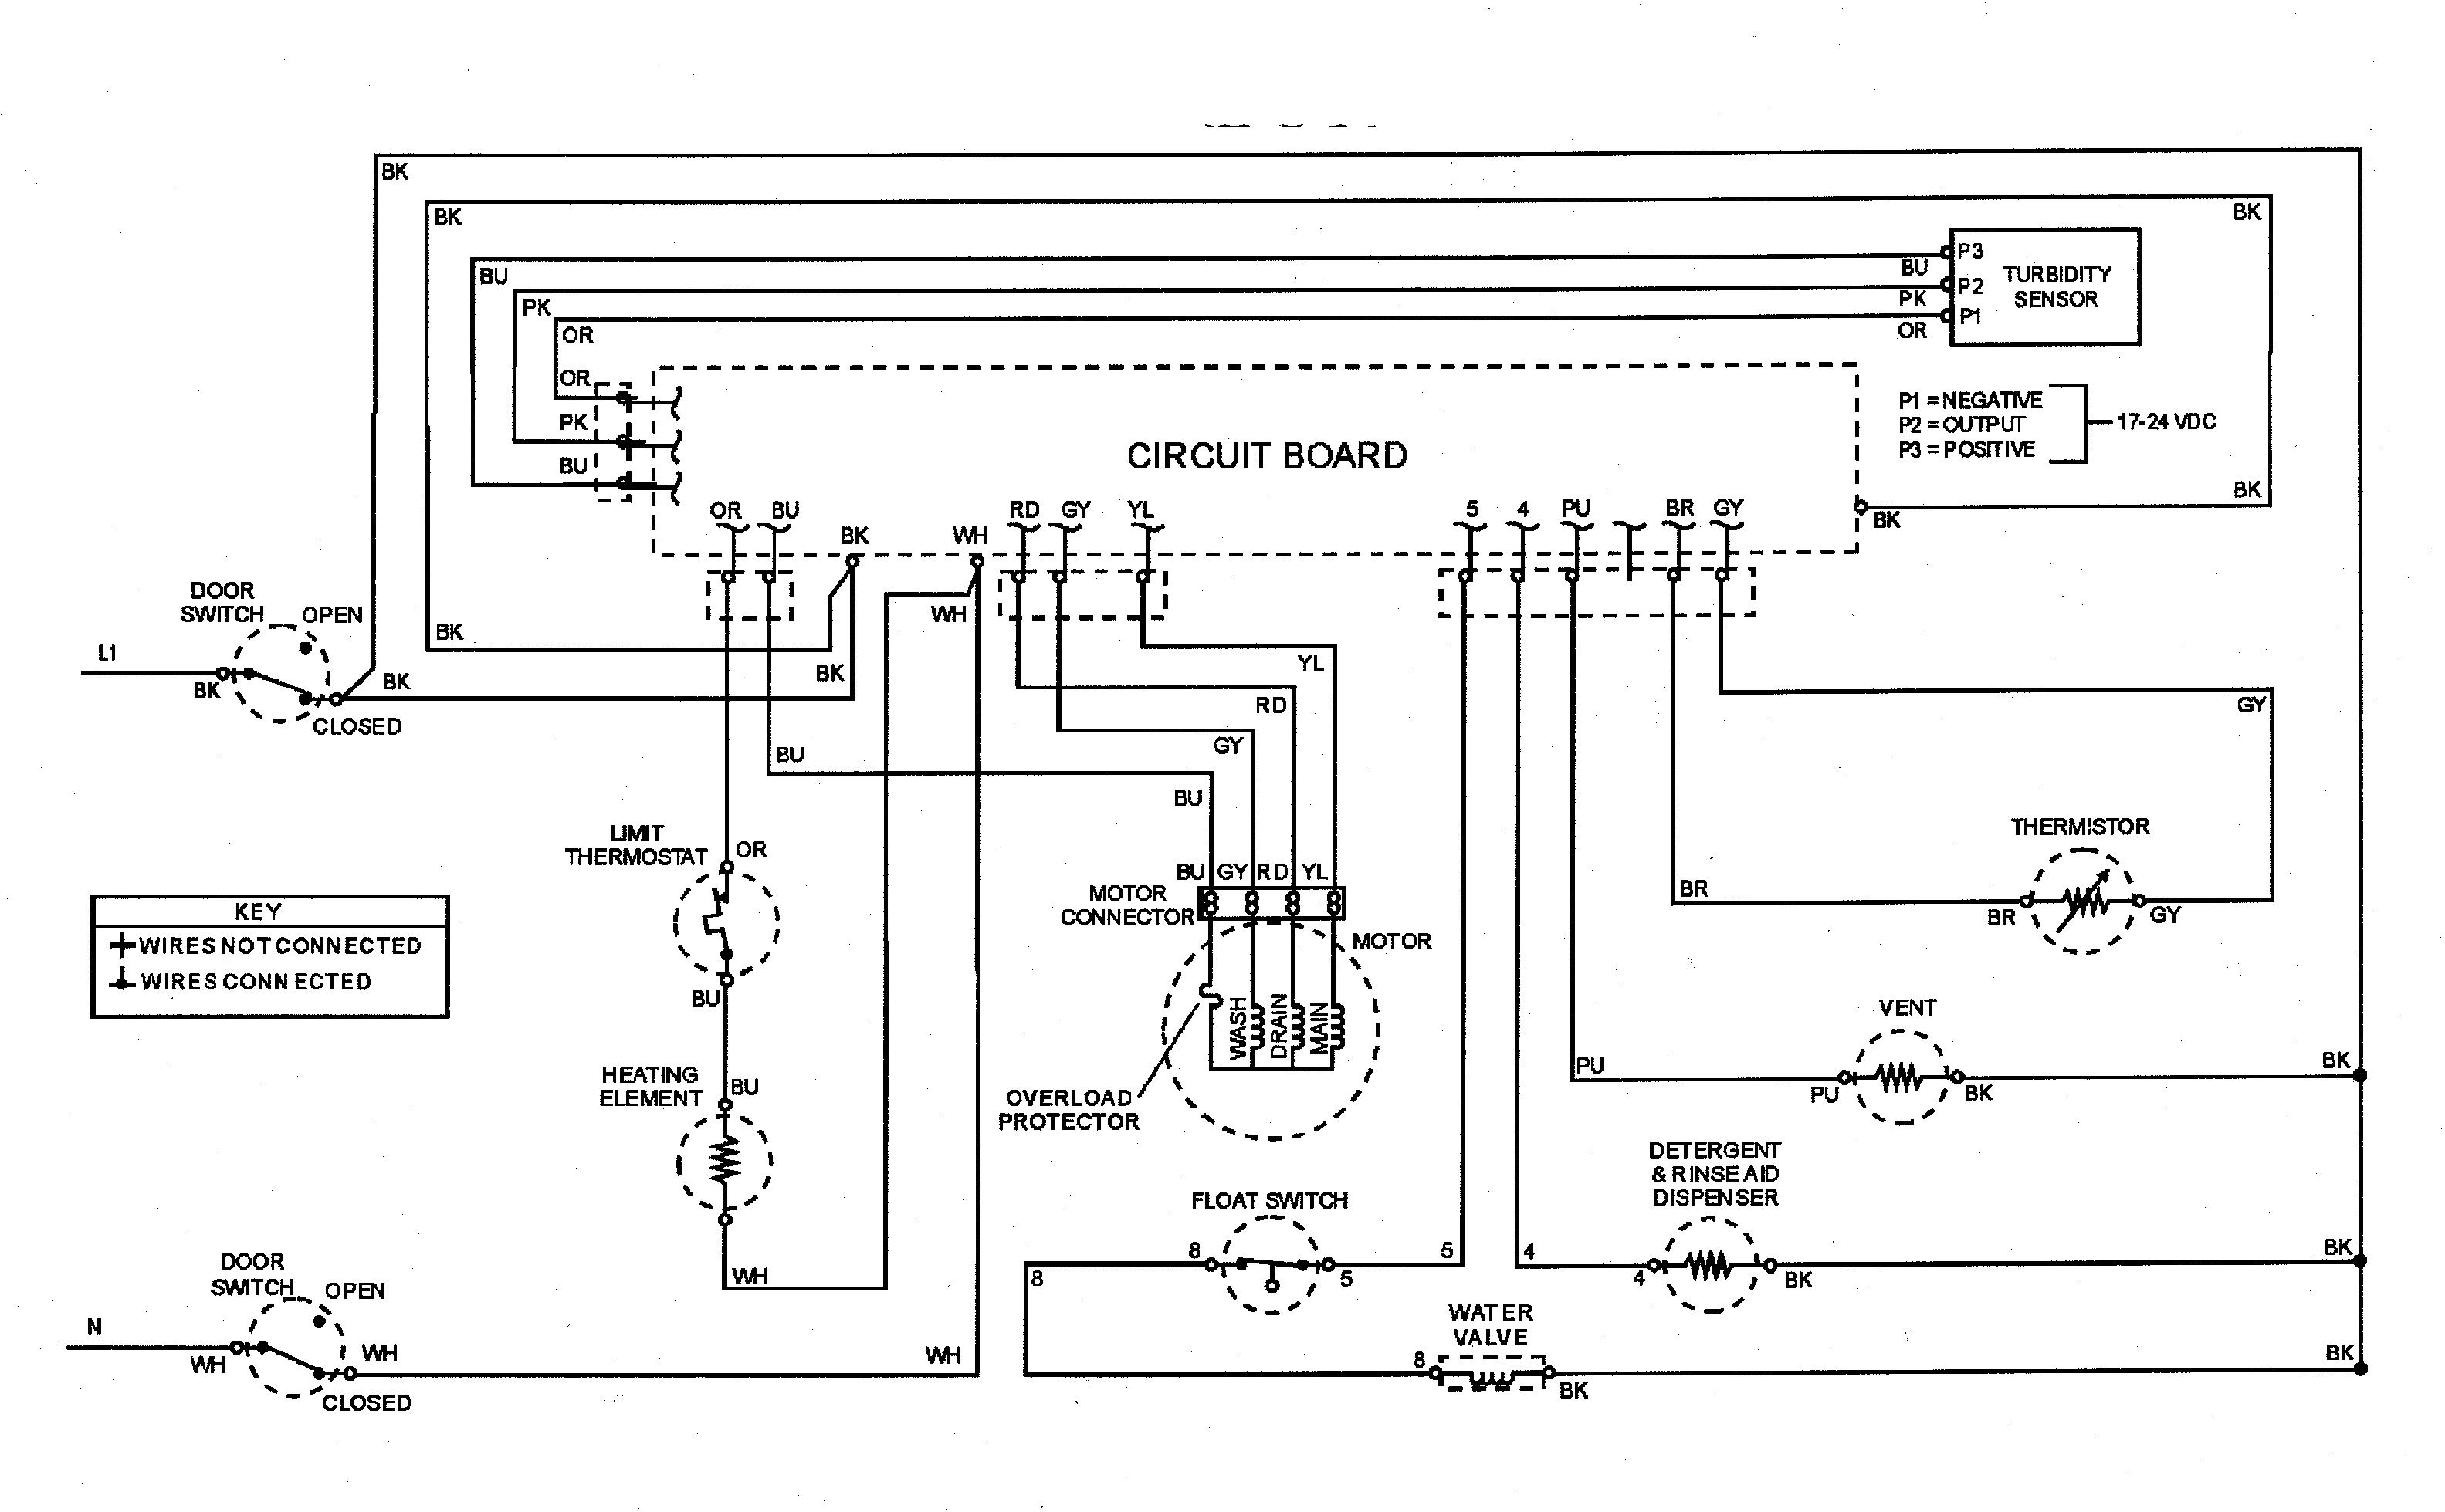 Maytag model MDB9150AWB dishwasher genuine parts